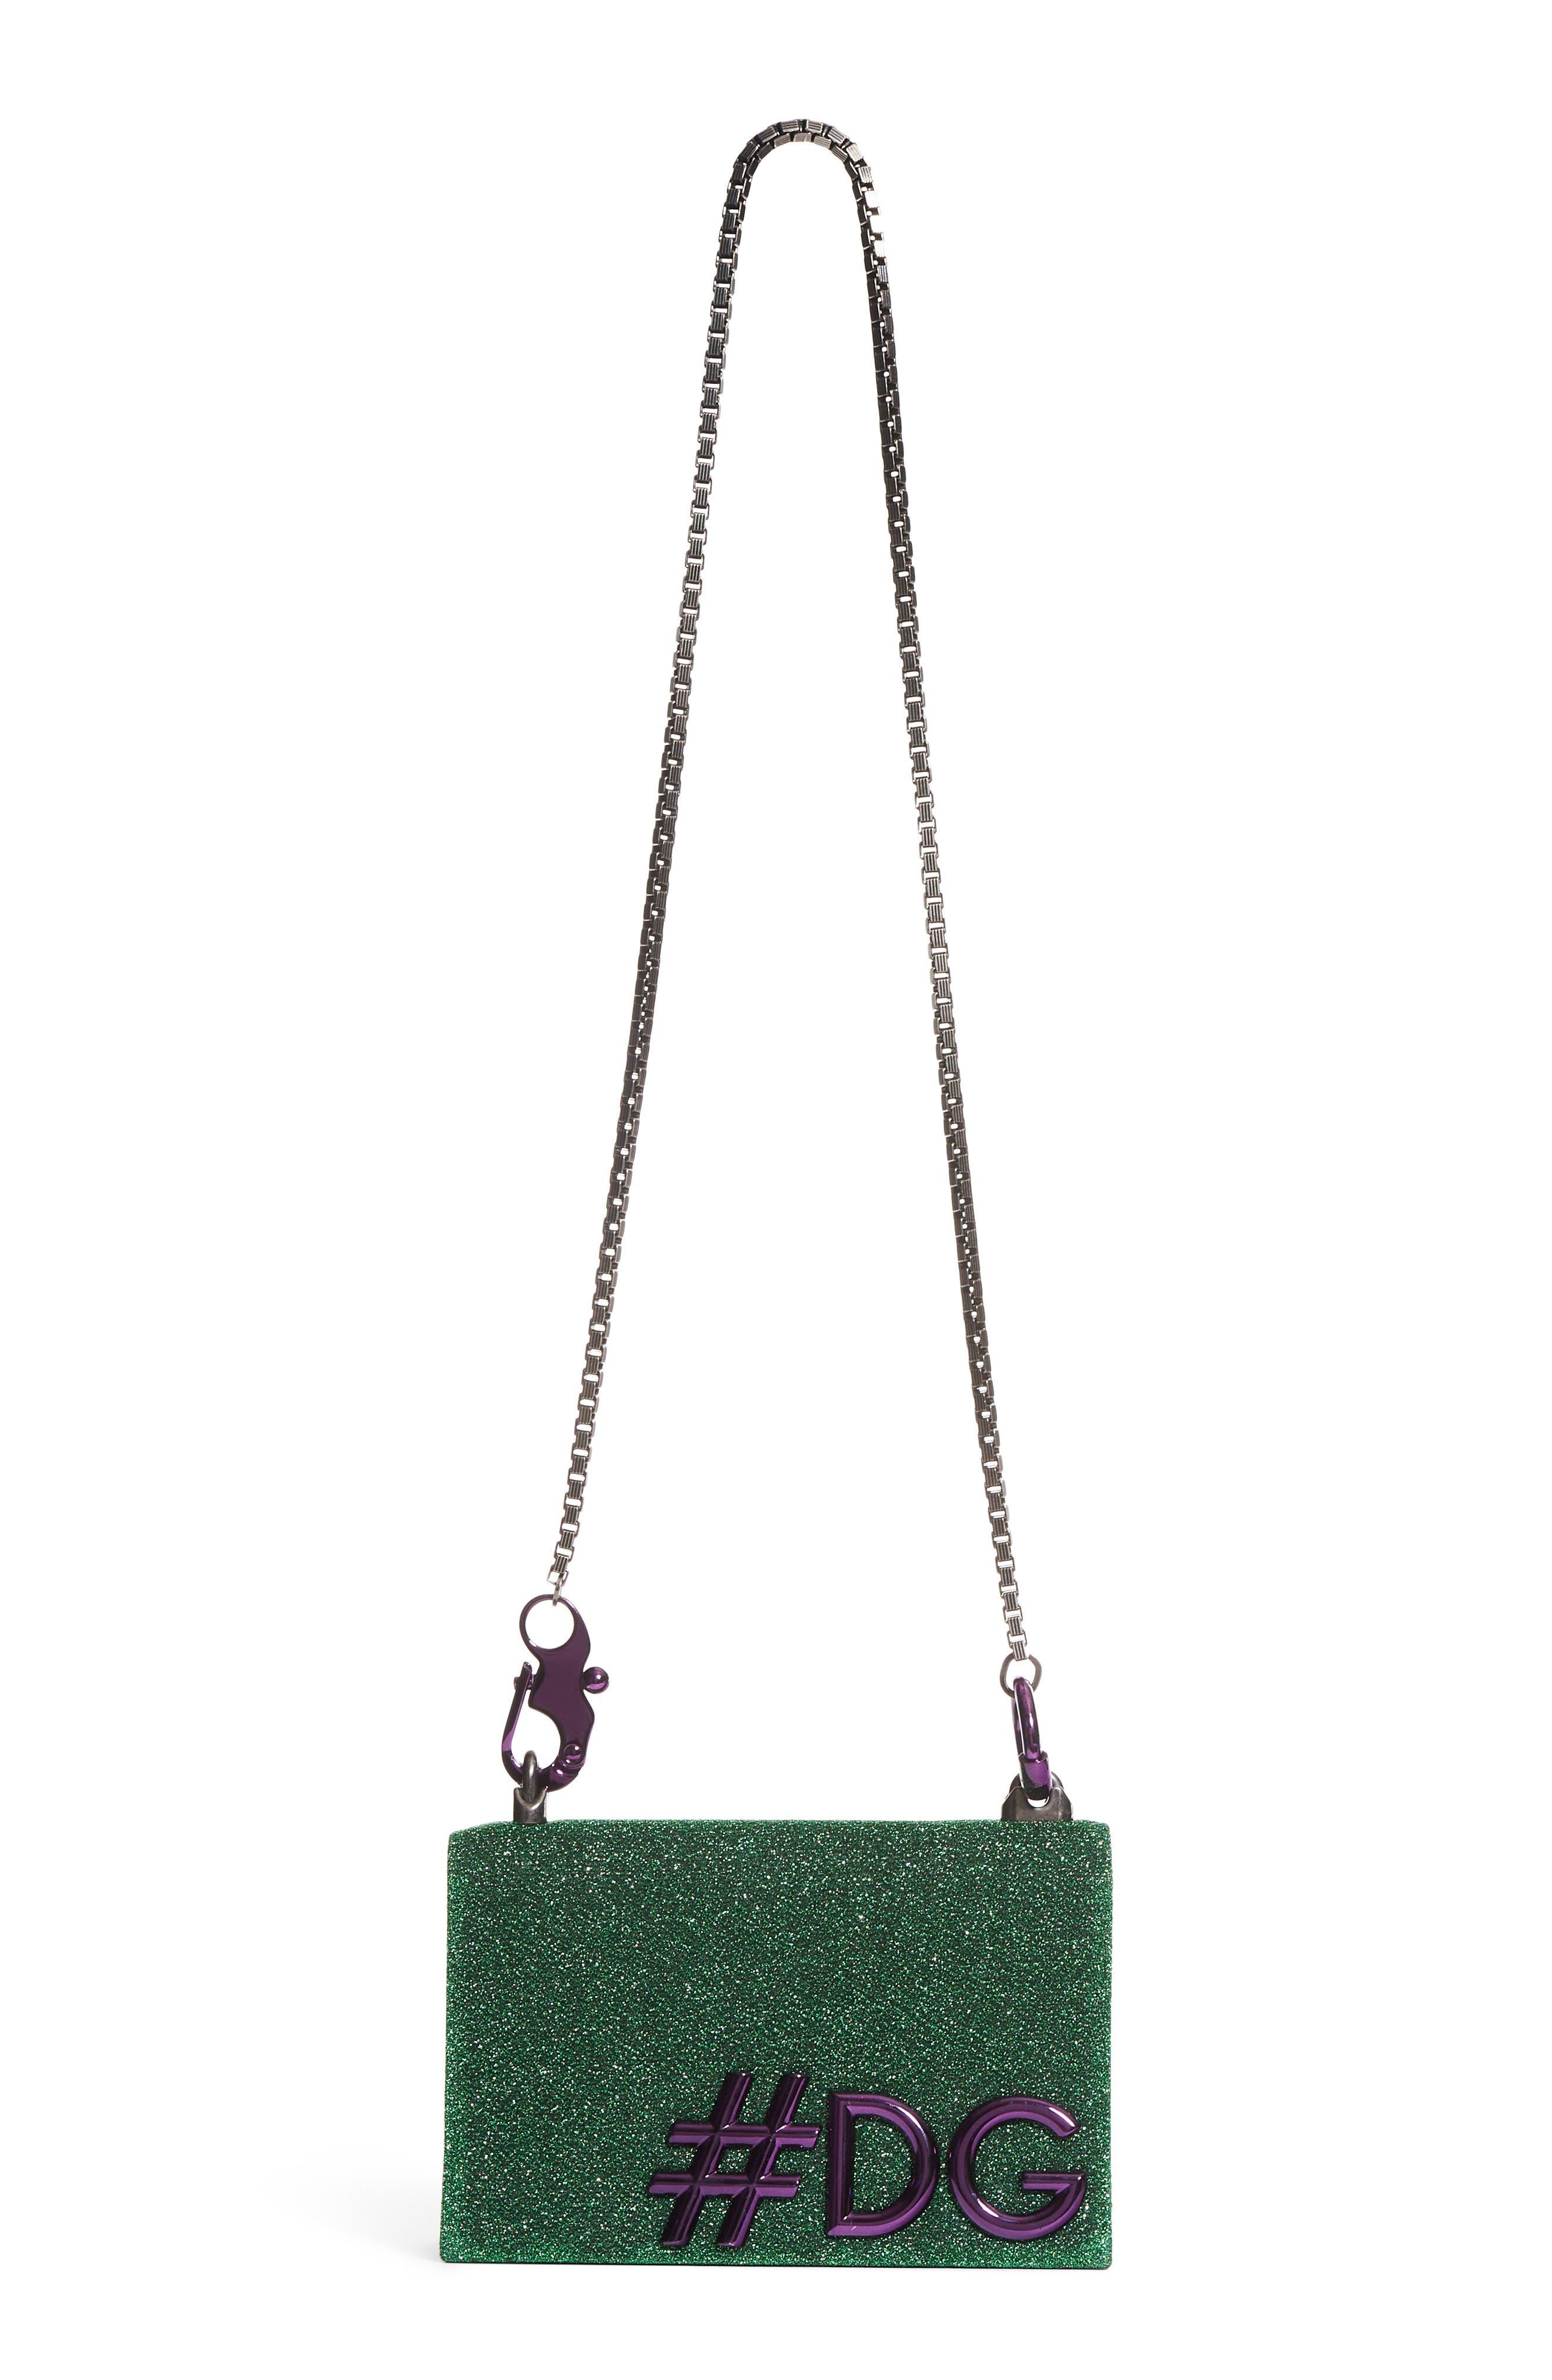 DG Girls Metallic Shoulder Bag,                             Main thumbnail 1, color,                             Green